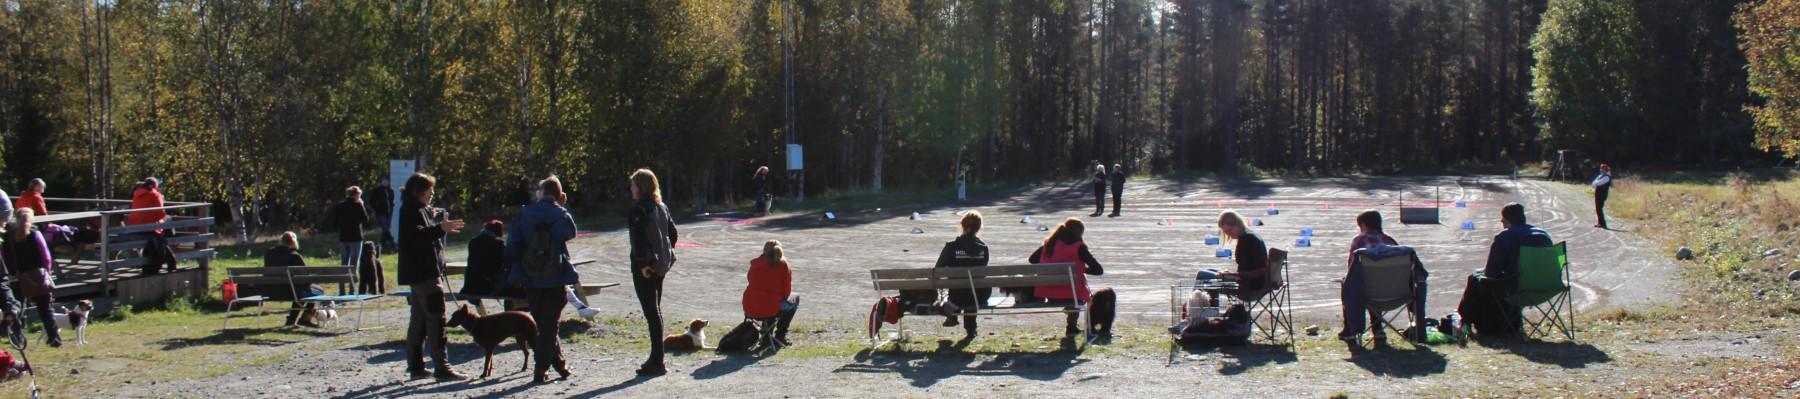 Holmsund brukshundklubb